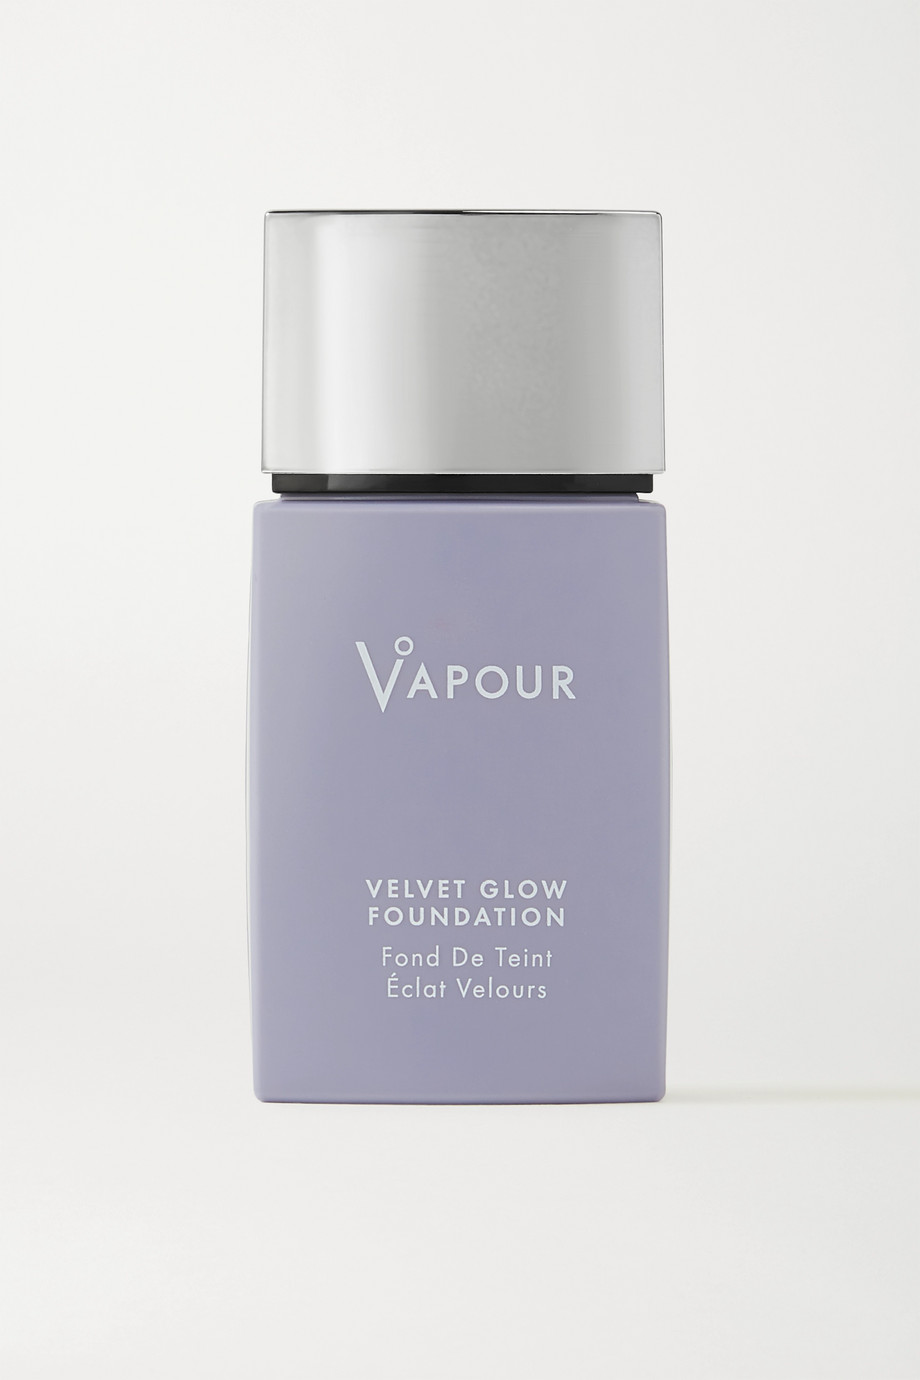 Vapour Beauty 丝绒润泽粉底液,30ml(色号:100V)